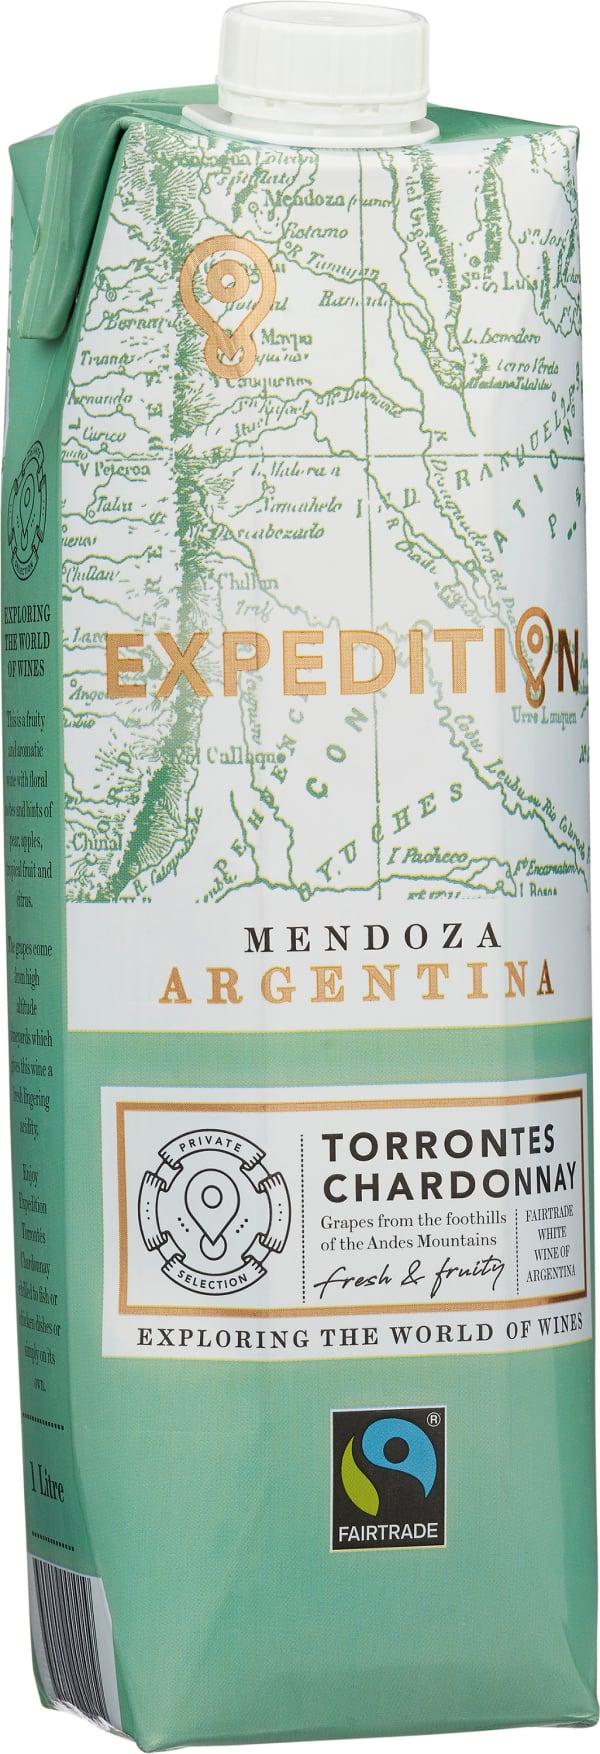 Expedition by Finca Las Moras Torrontés Chardonnay 2019 carton package